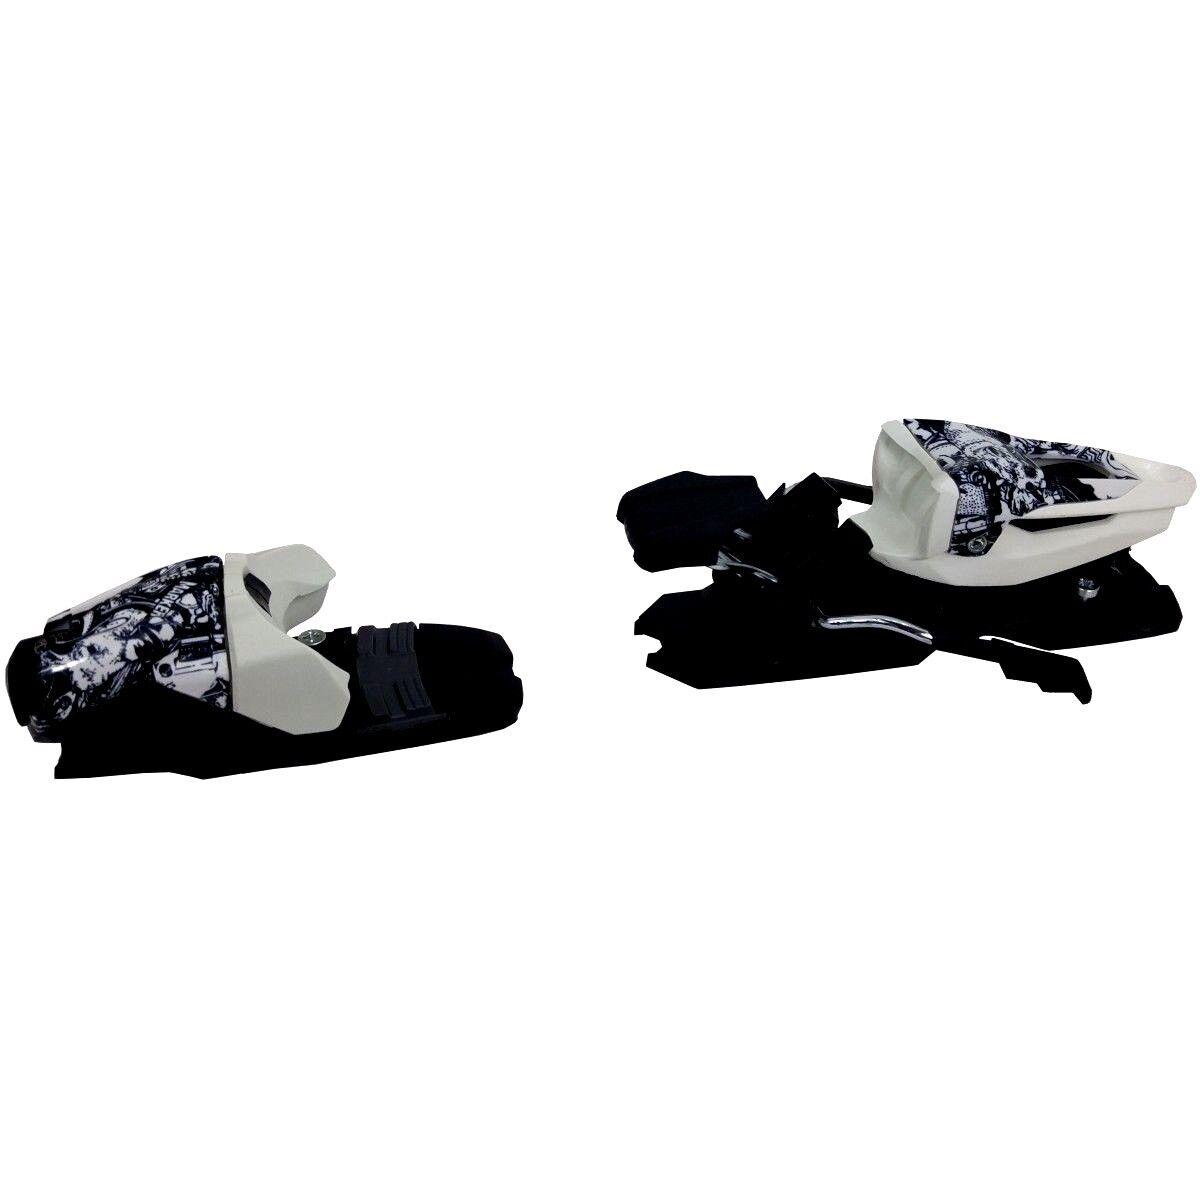 Marker 10.0 Free Ski Bindings -- Größe  110MM BRAKE --- NEW